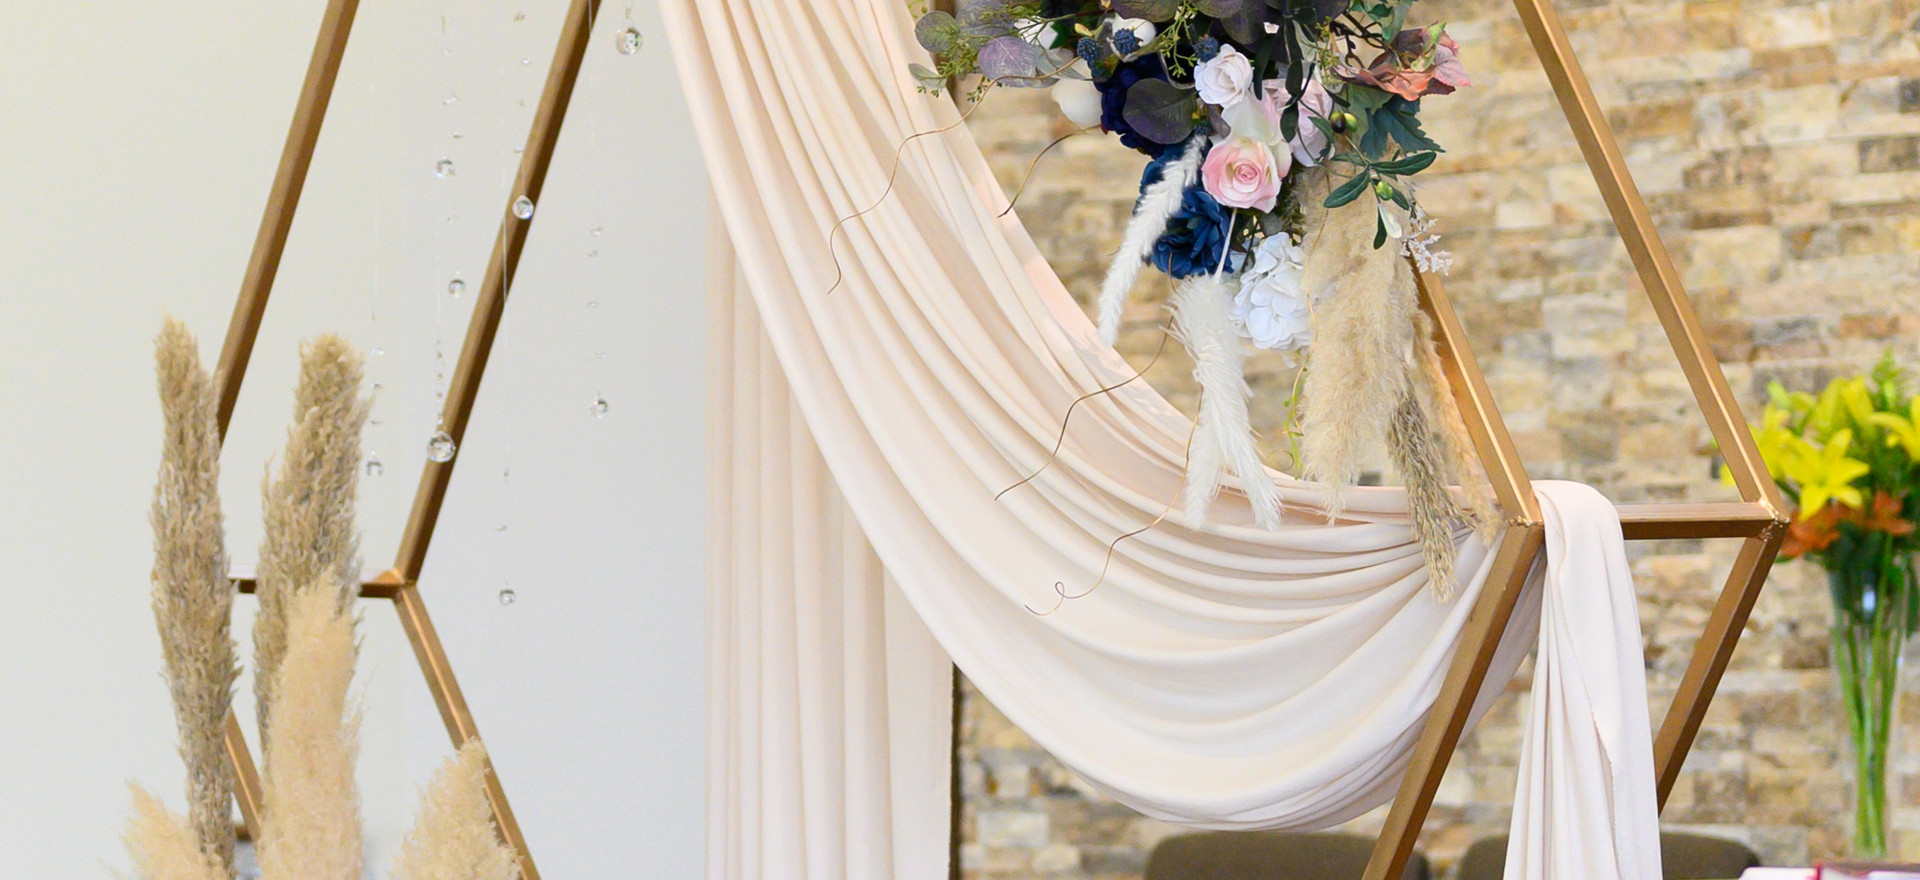 031_Lorena and Mike's Wedding day.jpg